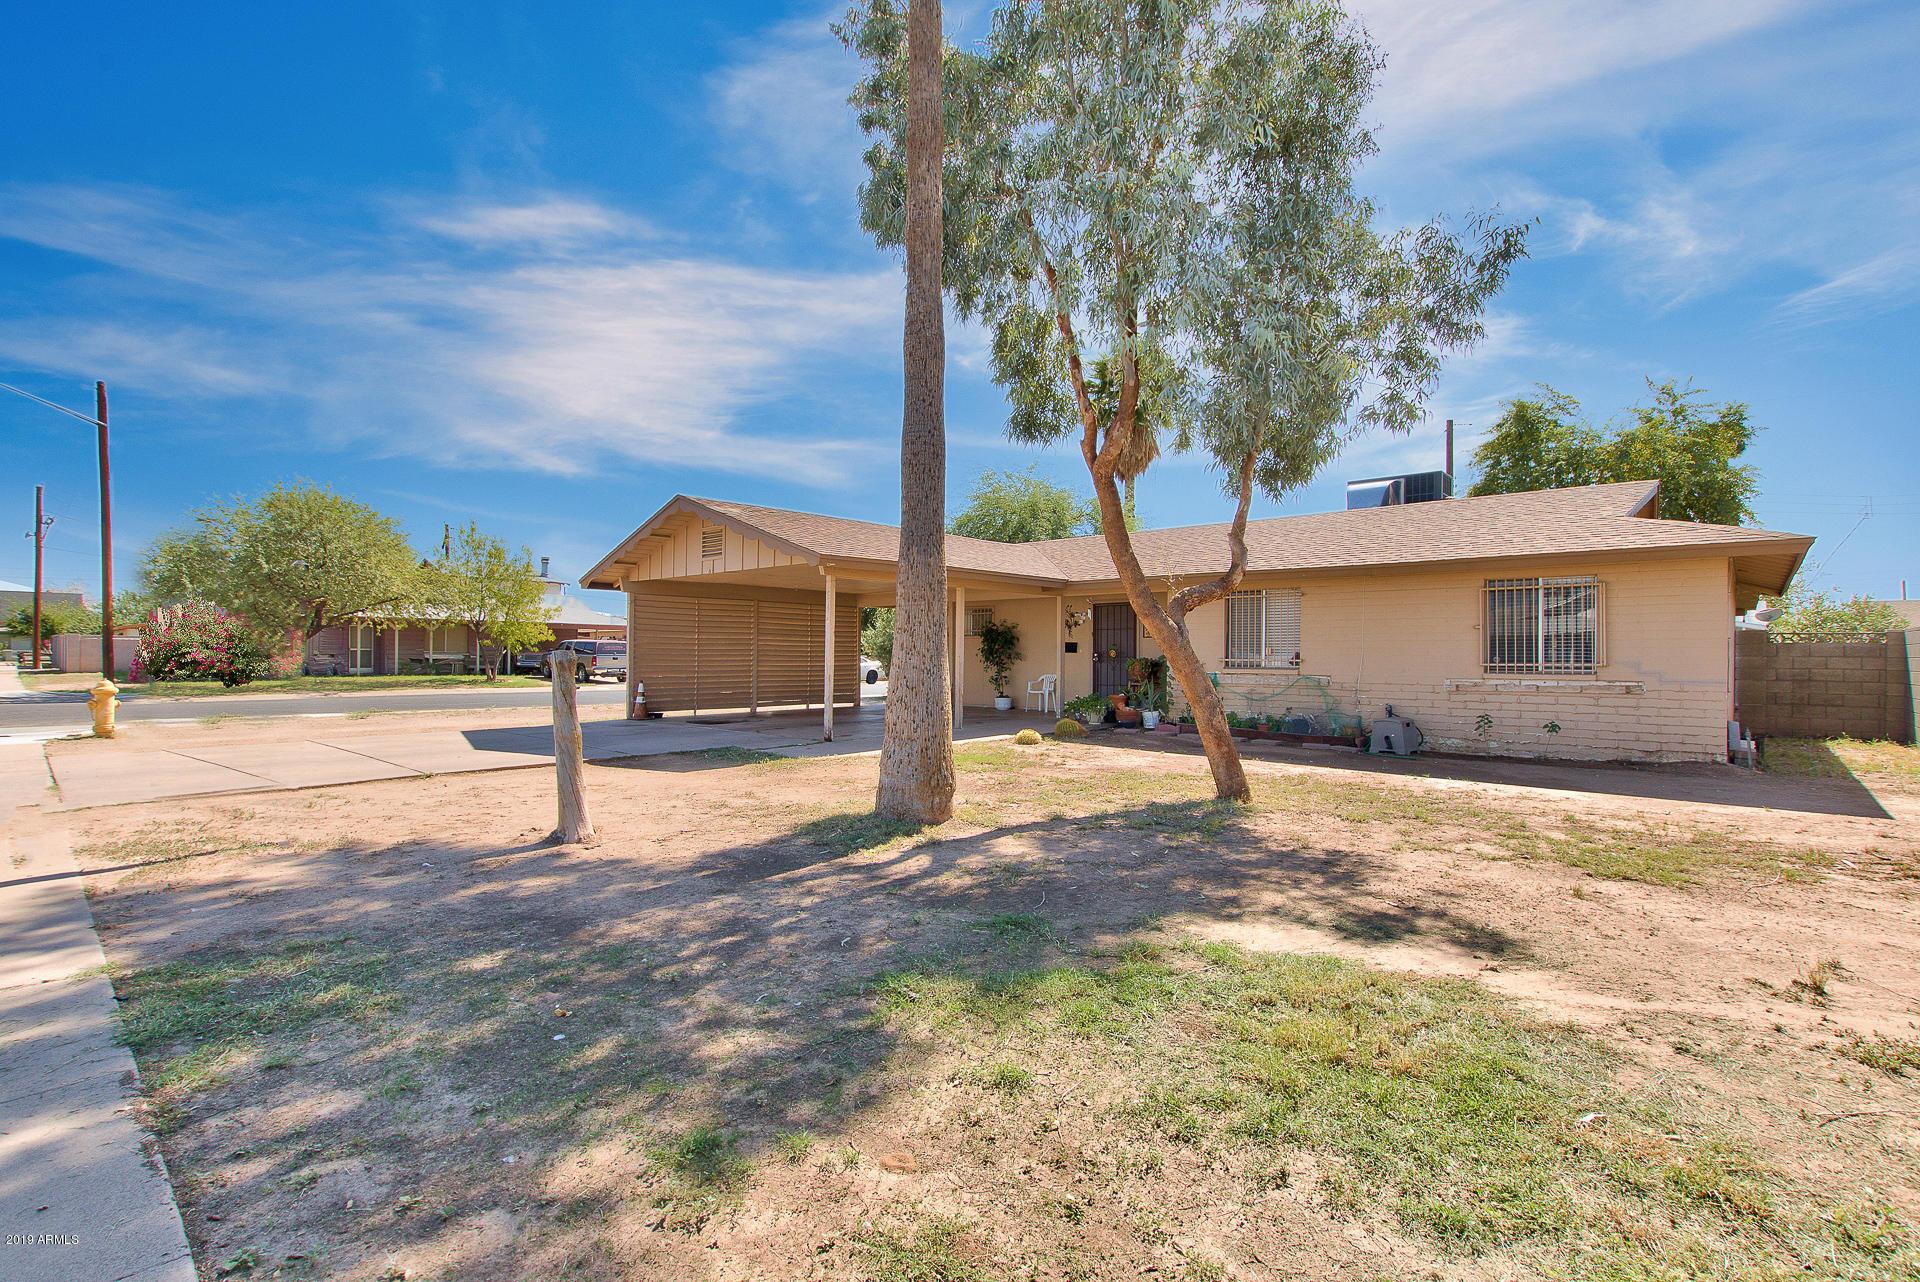 Photo of 5149 W LEWIS Avenue, Phoenix, AZ 85035